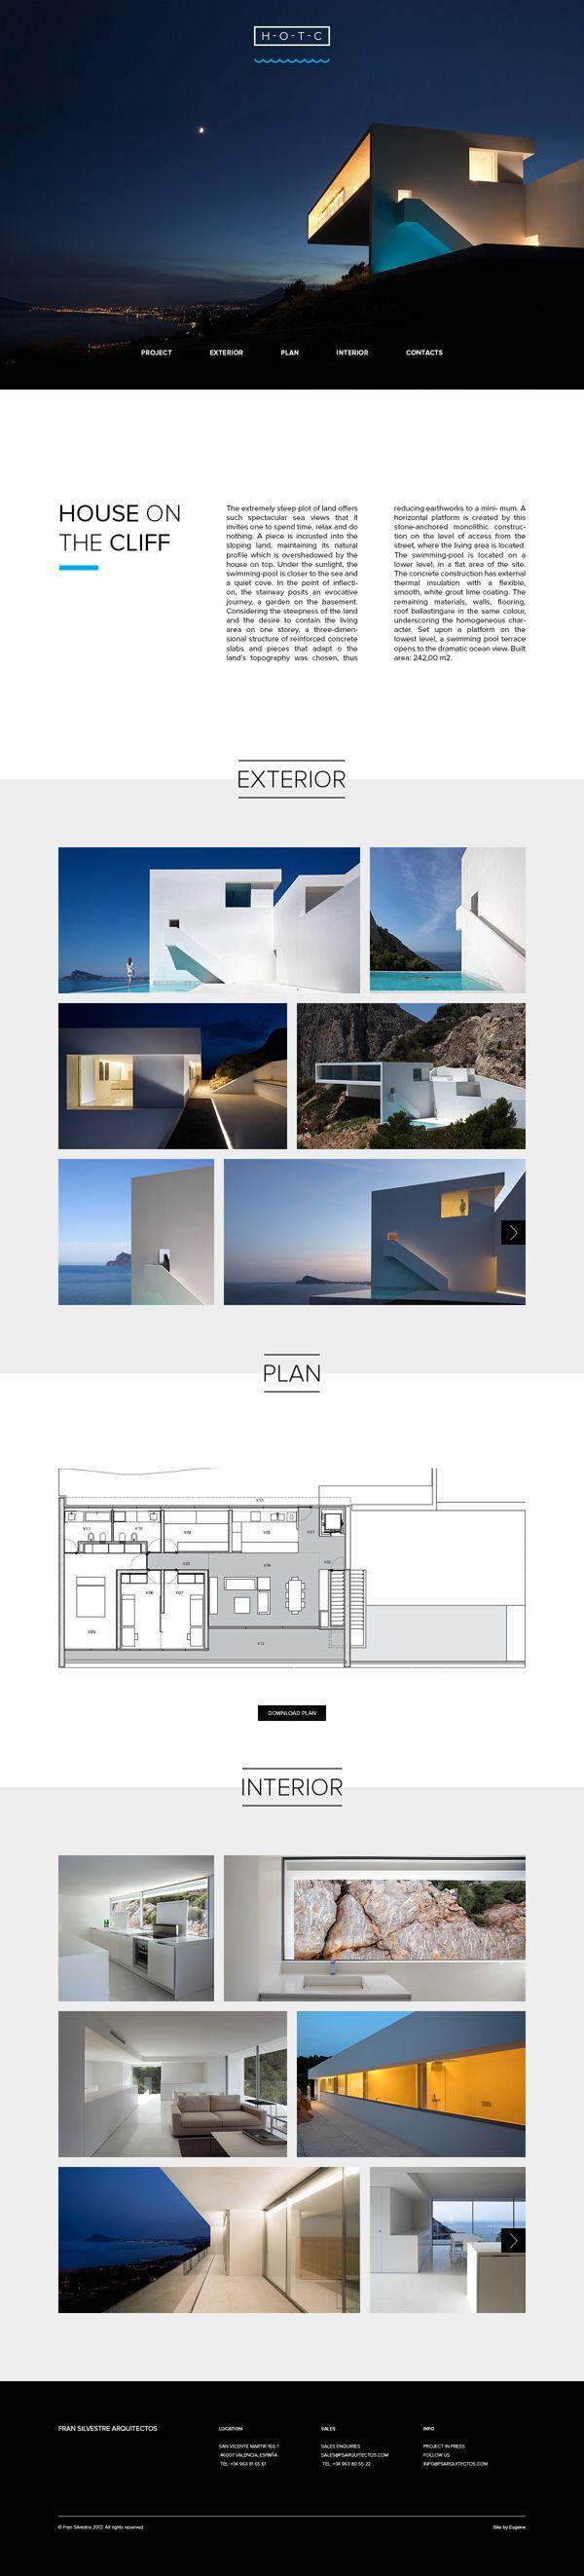 Website design for architecture project by Eugene Maksymchuk, via Behance